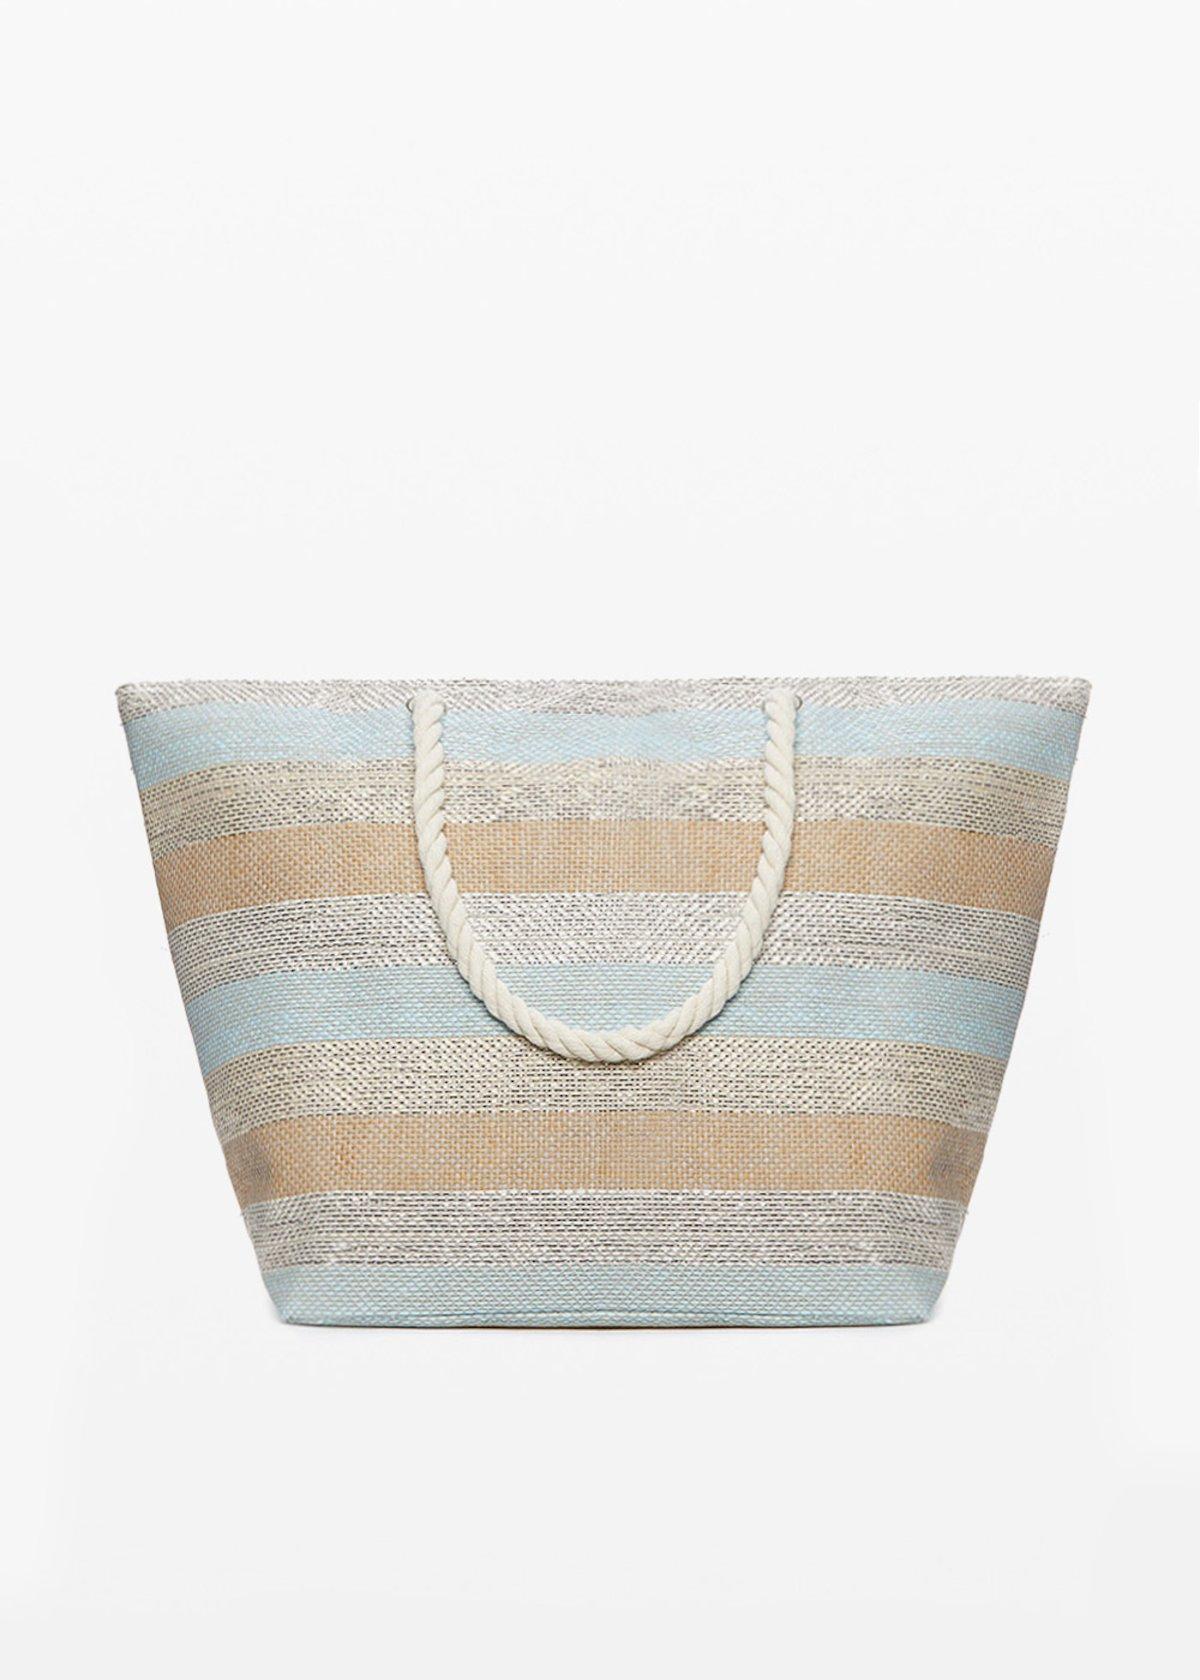 Buzzy macro-stripes fantasy shopping bag with zip closure - Sky   Stripes - Woman